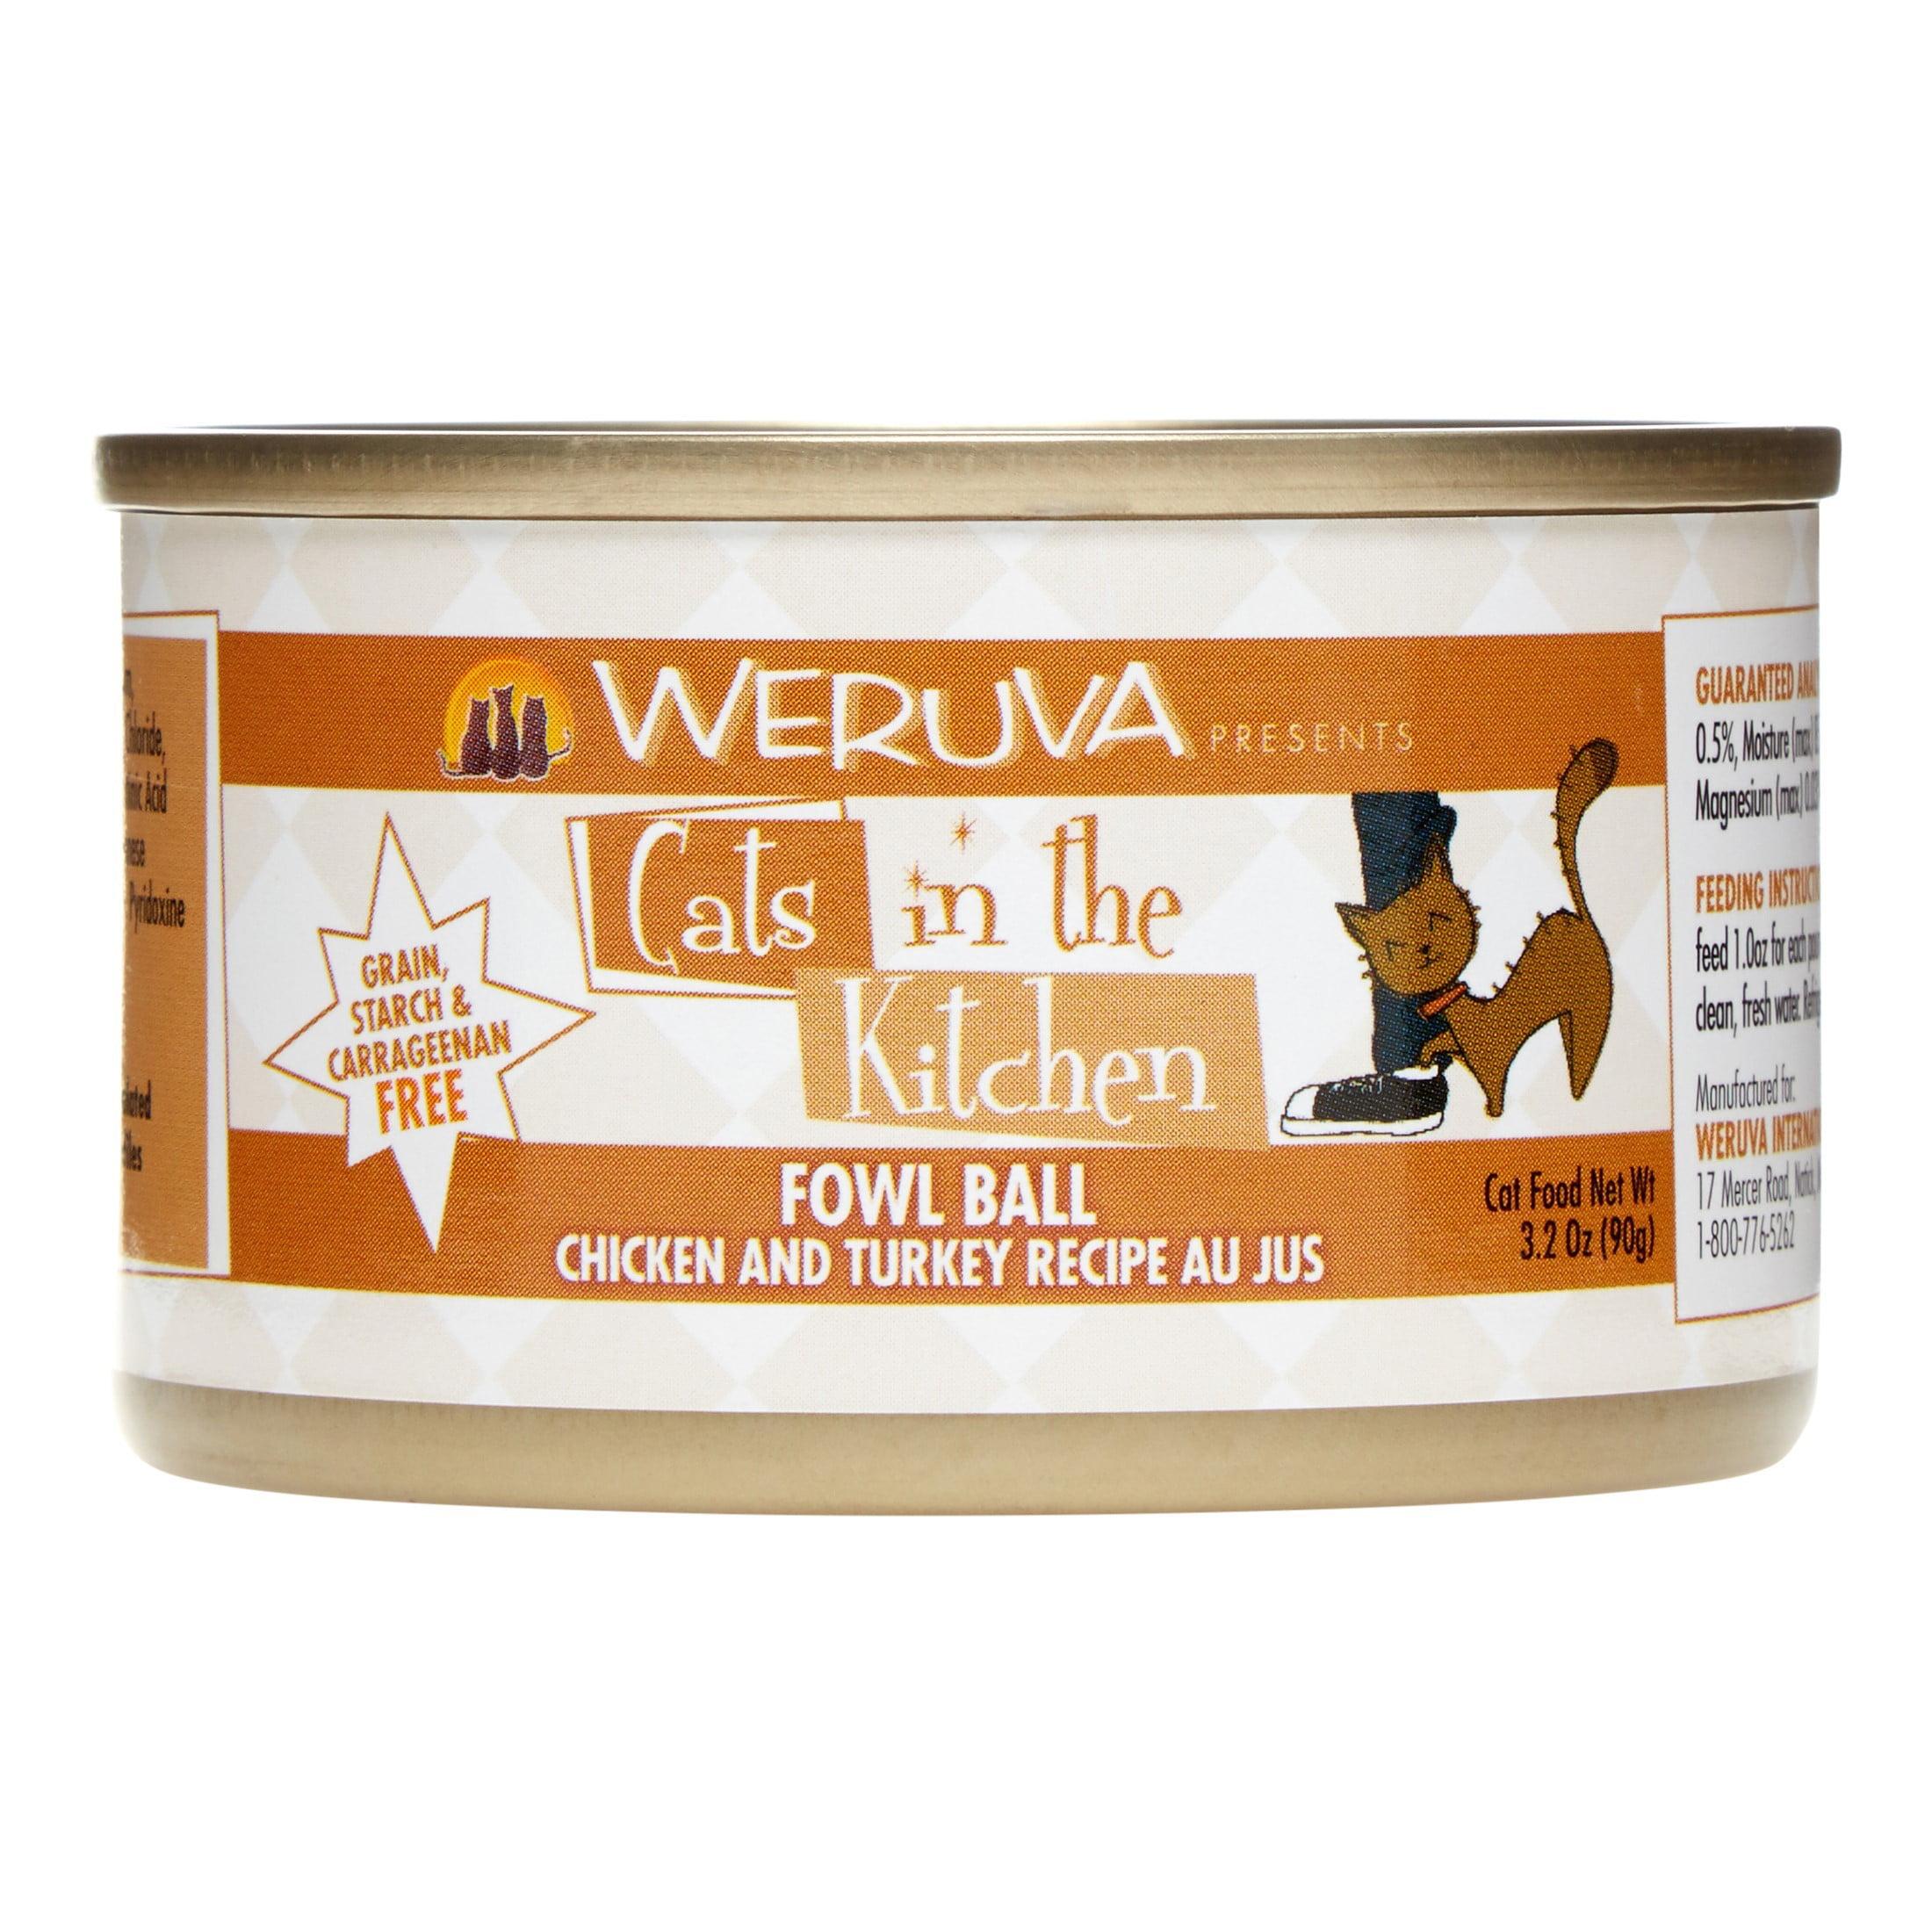 Weruva Cats in the Kitchen Grain-Free Fowl Ball Chicken & Tuckey Recipe Wet Cat Food, 3.2 Oz (24 Pack)